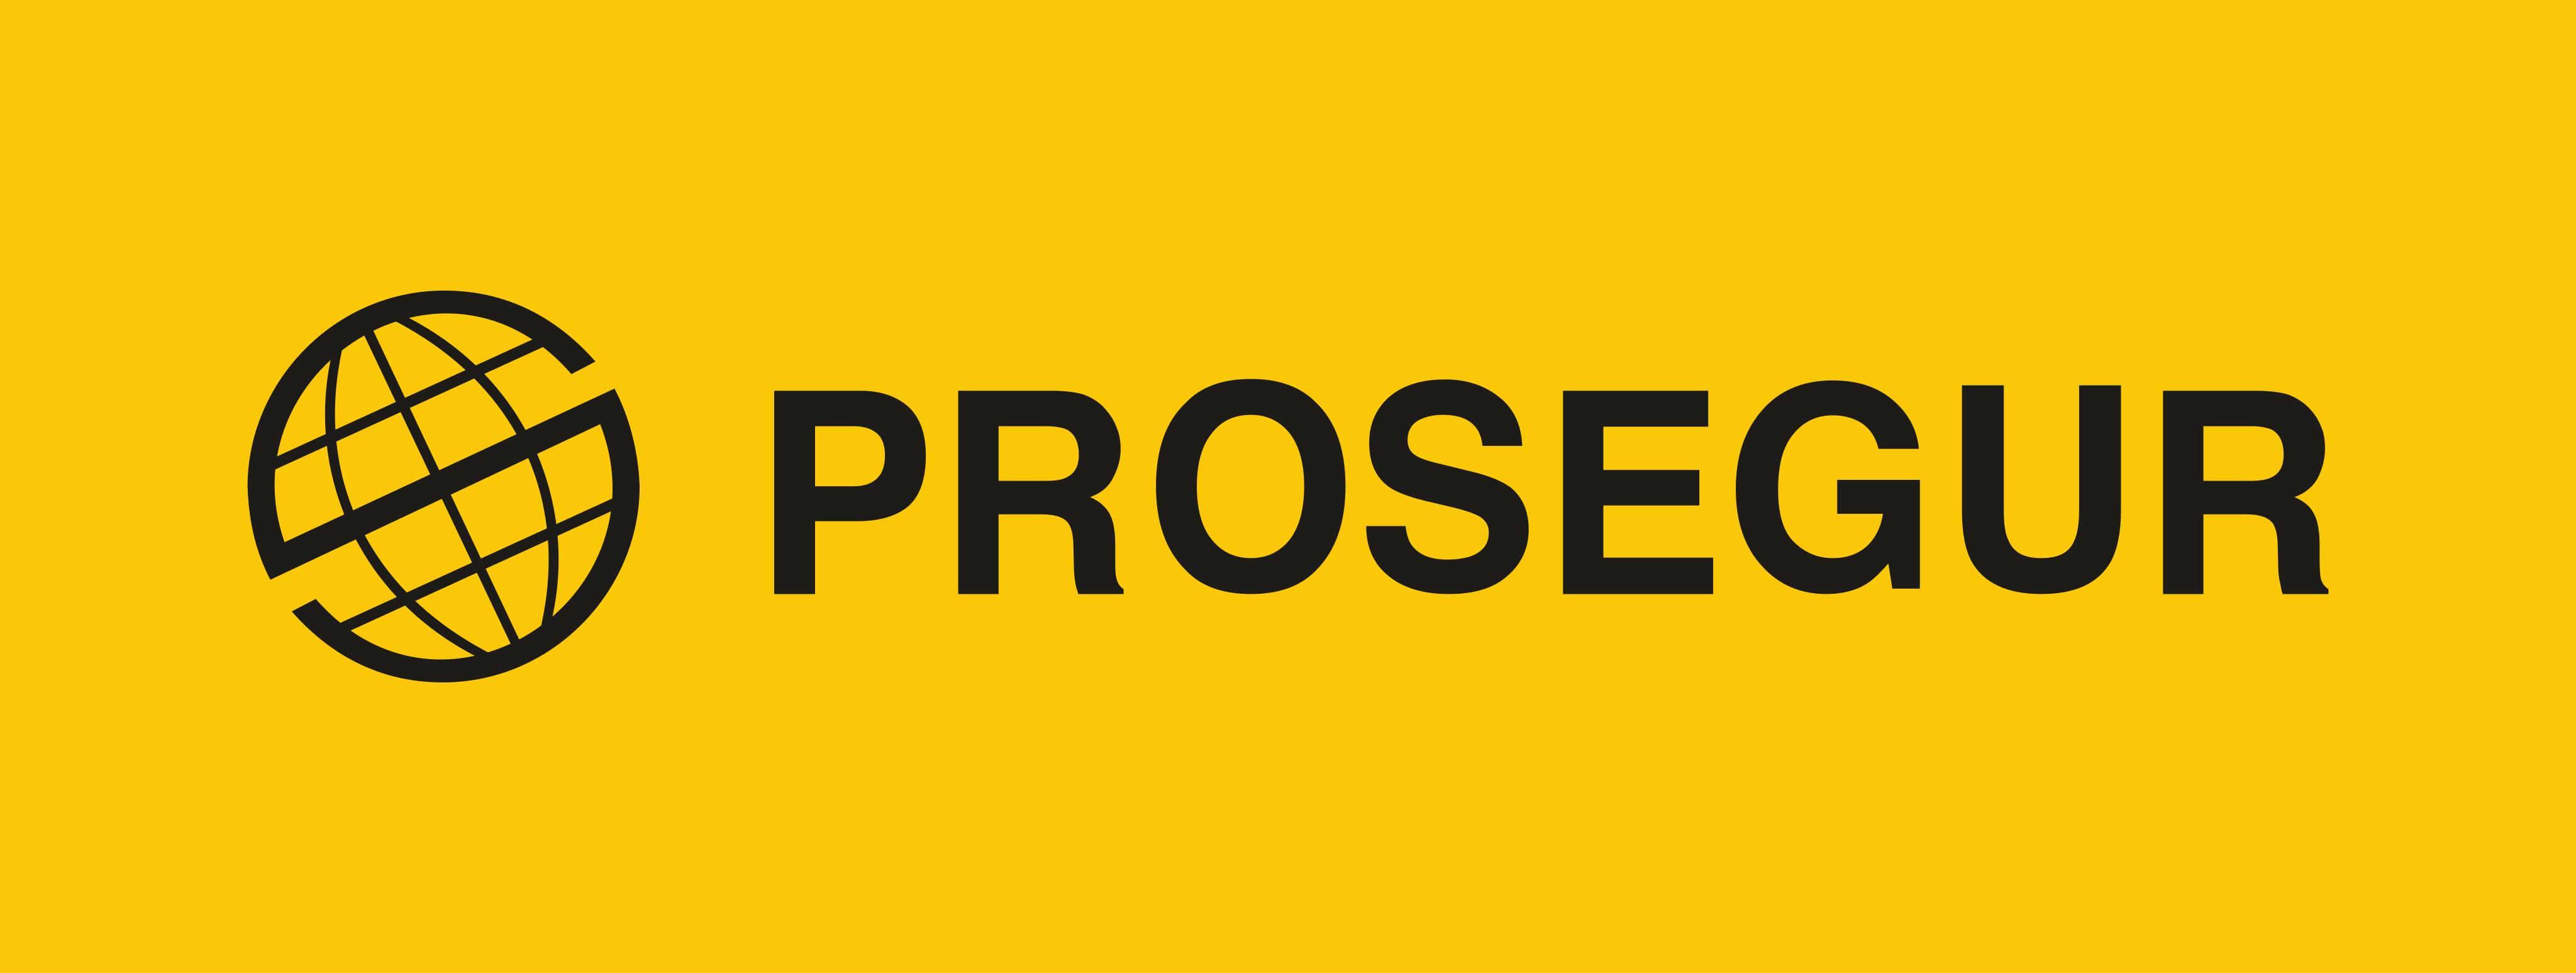 Prosegur Logo.